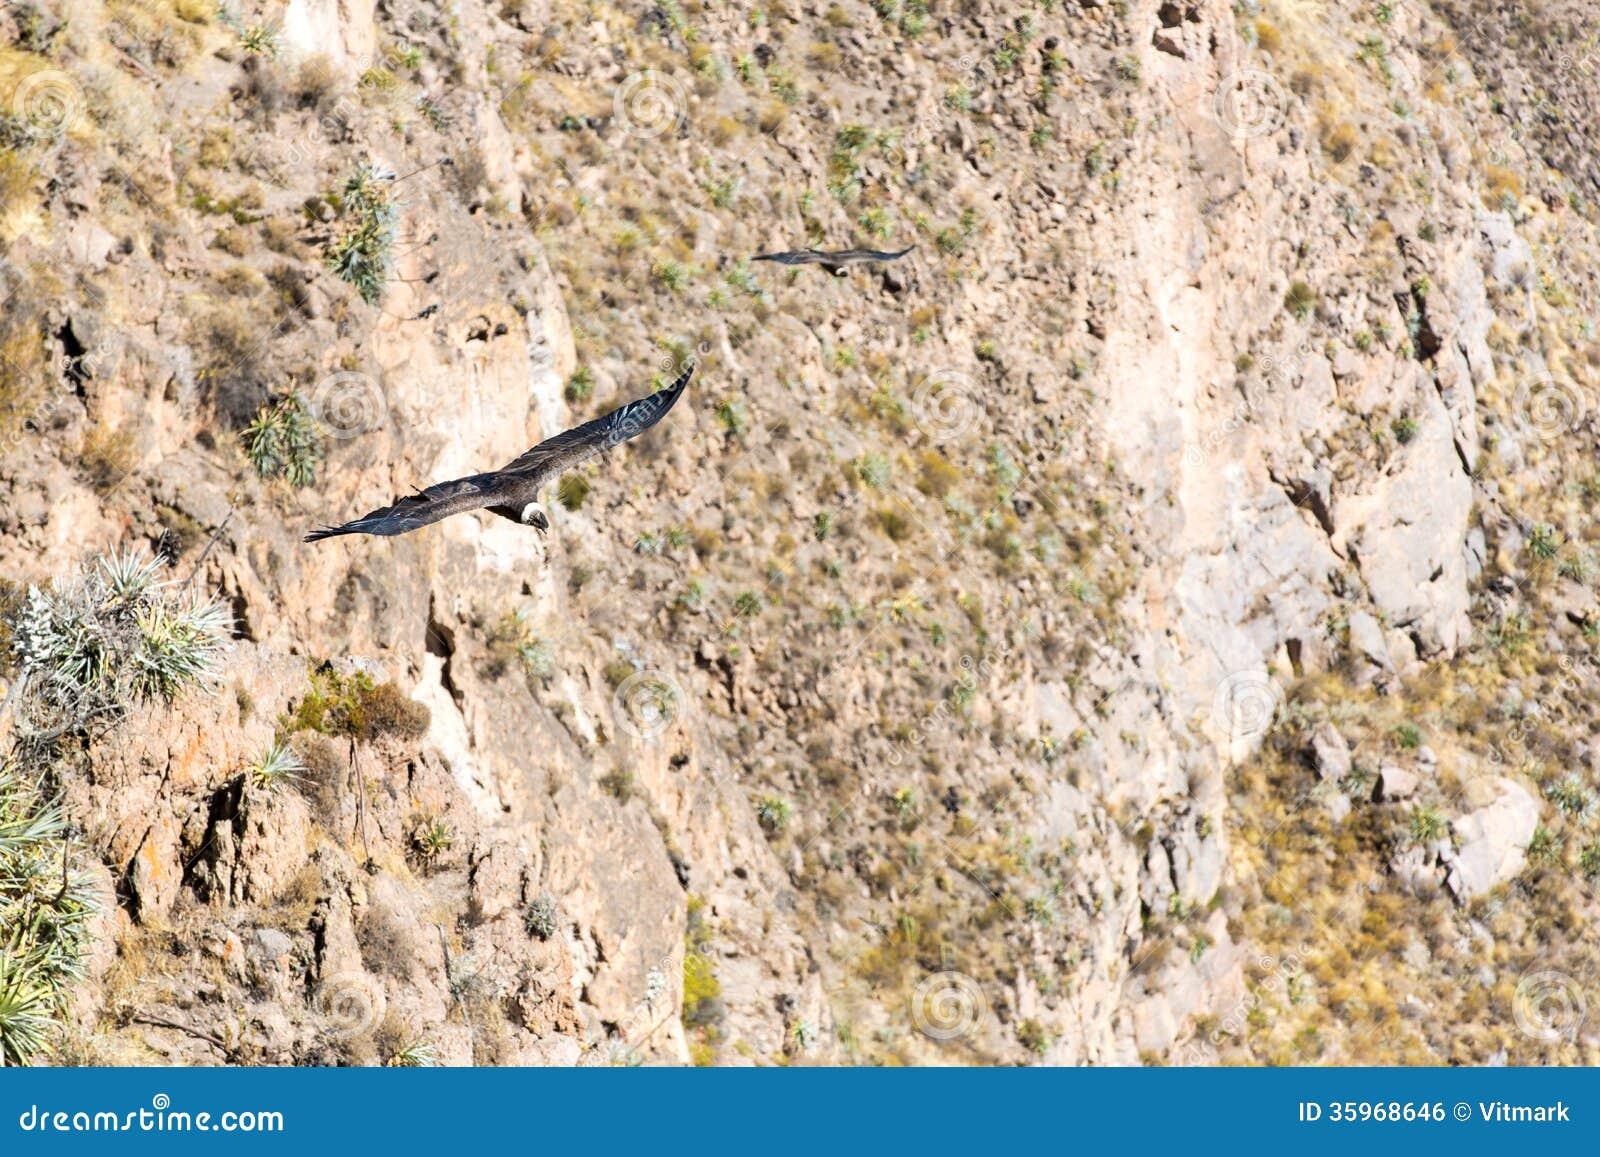 Vliegende condor over Colca-canion, Peru, Zuid-Amerika. Deze condor de grootste vliegende vogel